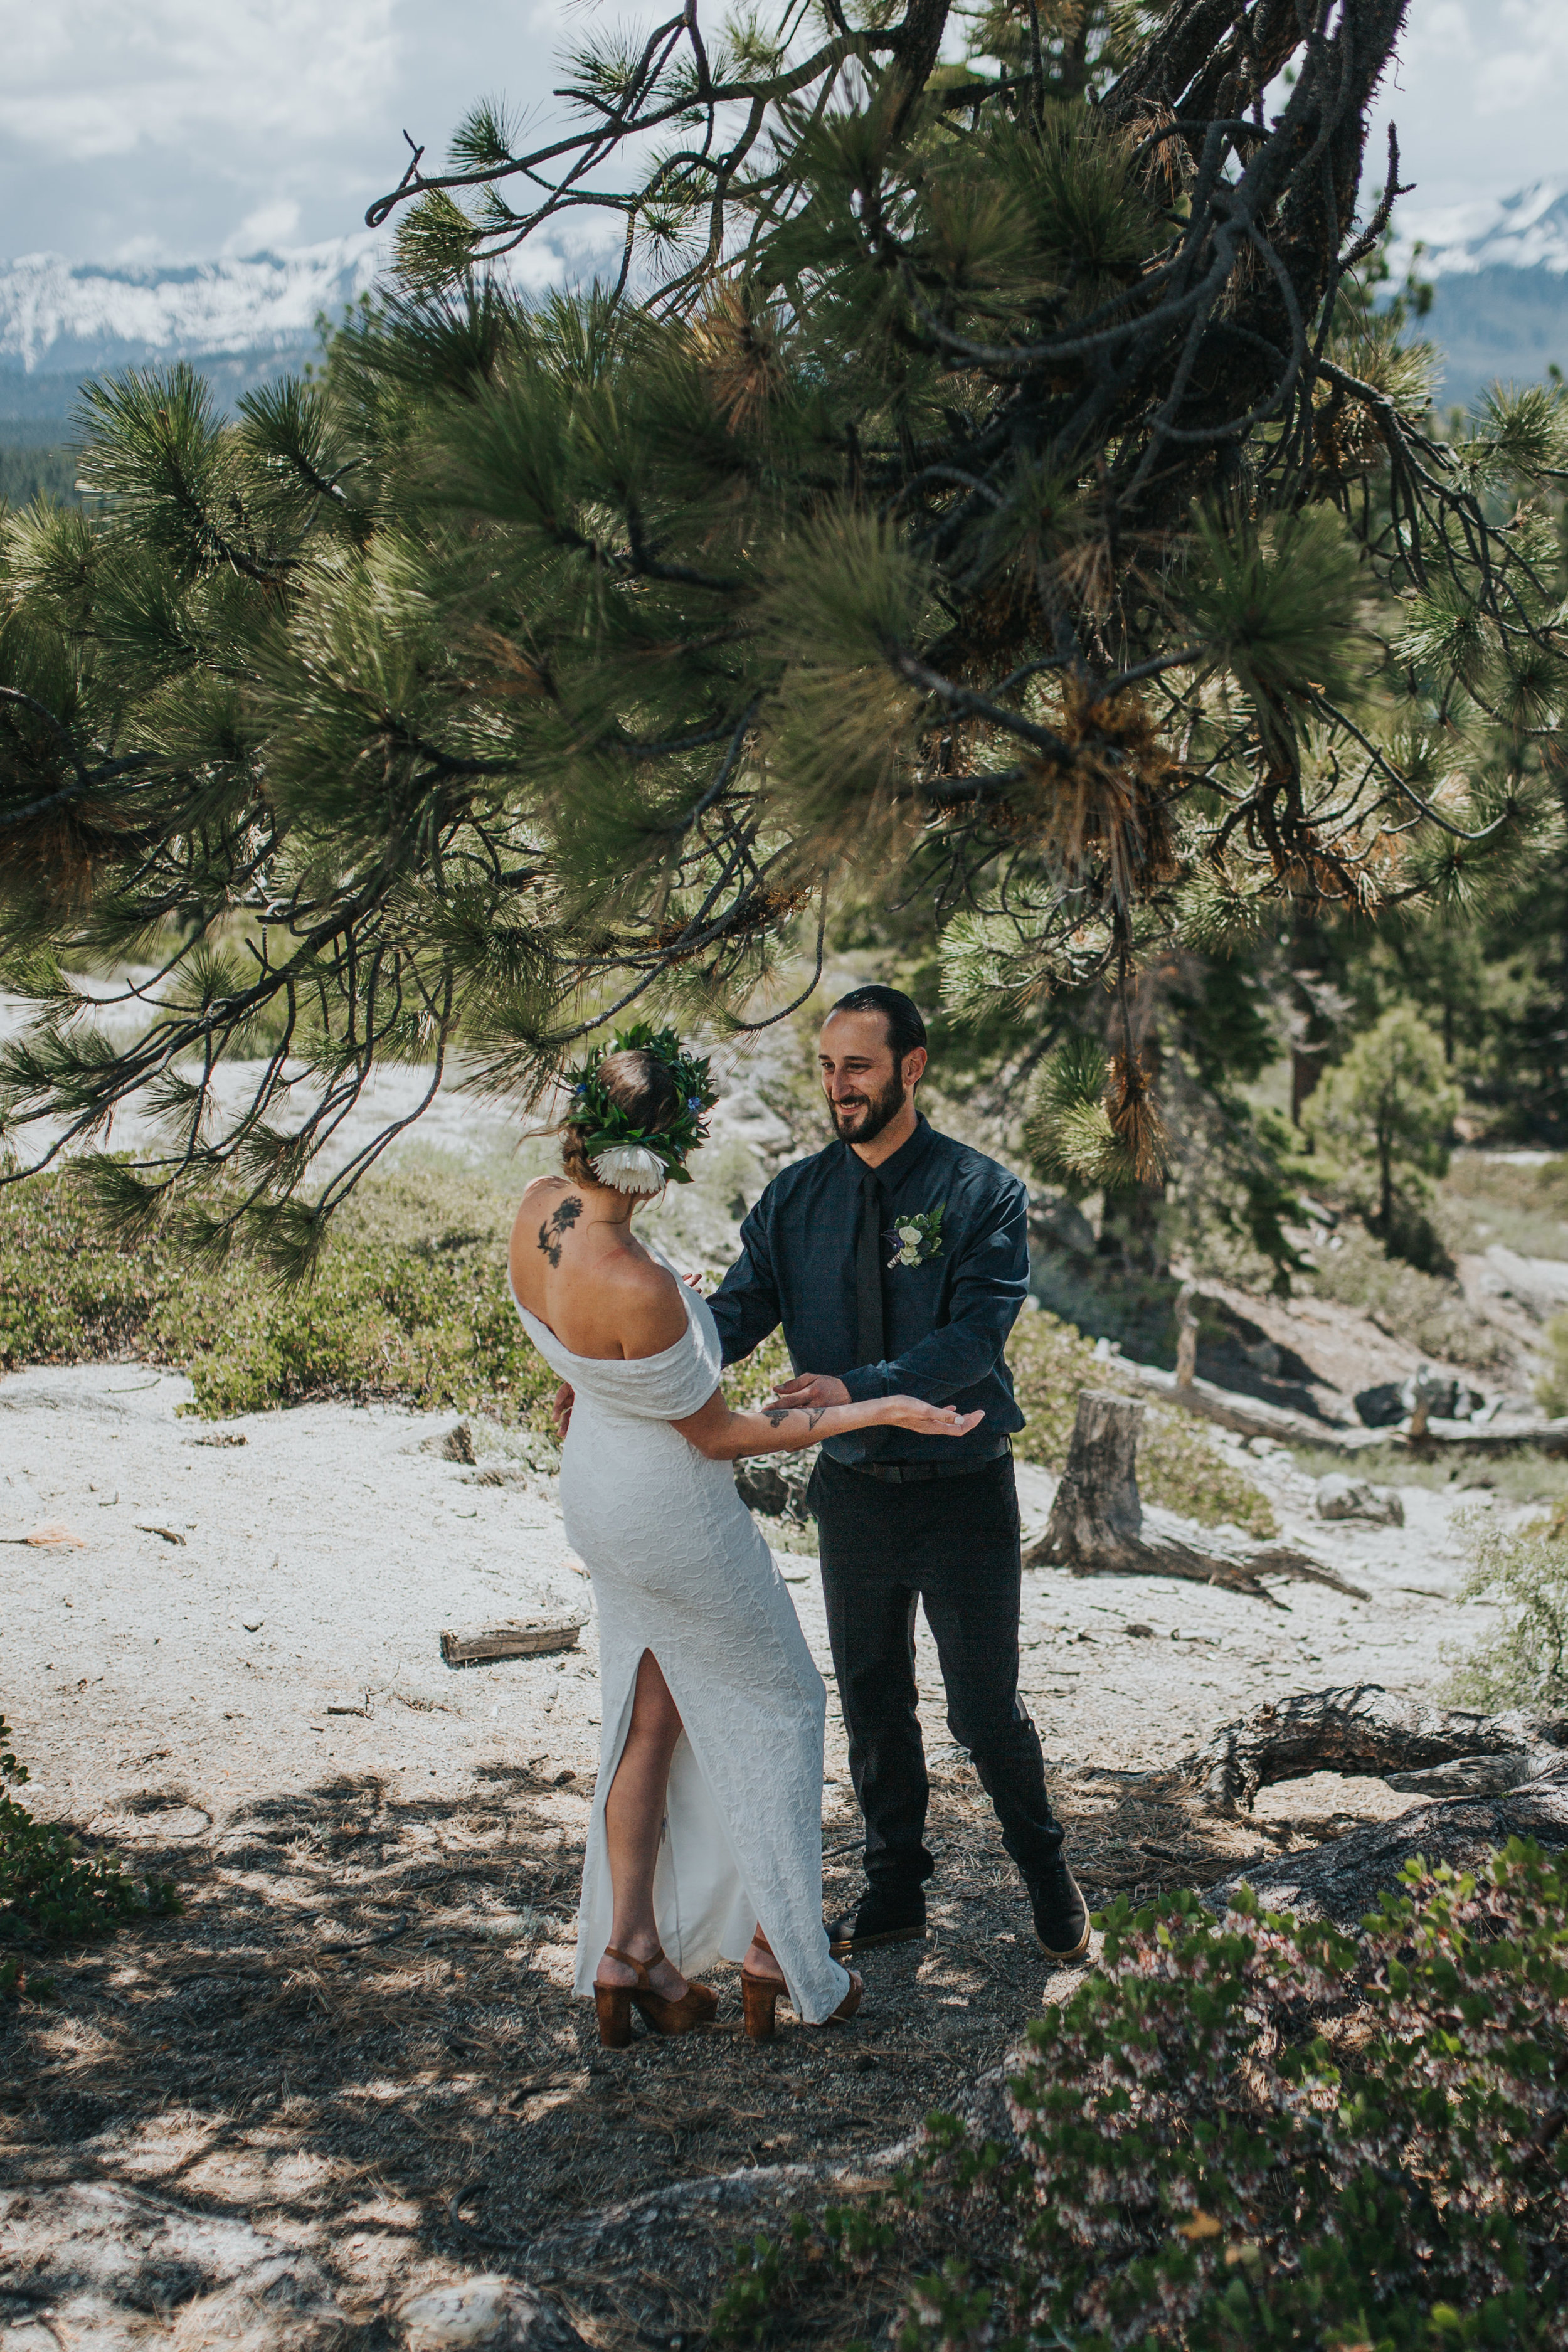 south-lake-tahoe-elopement-valerie-lendvay-photo-009.jpg